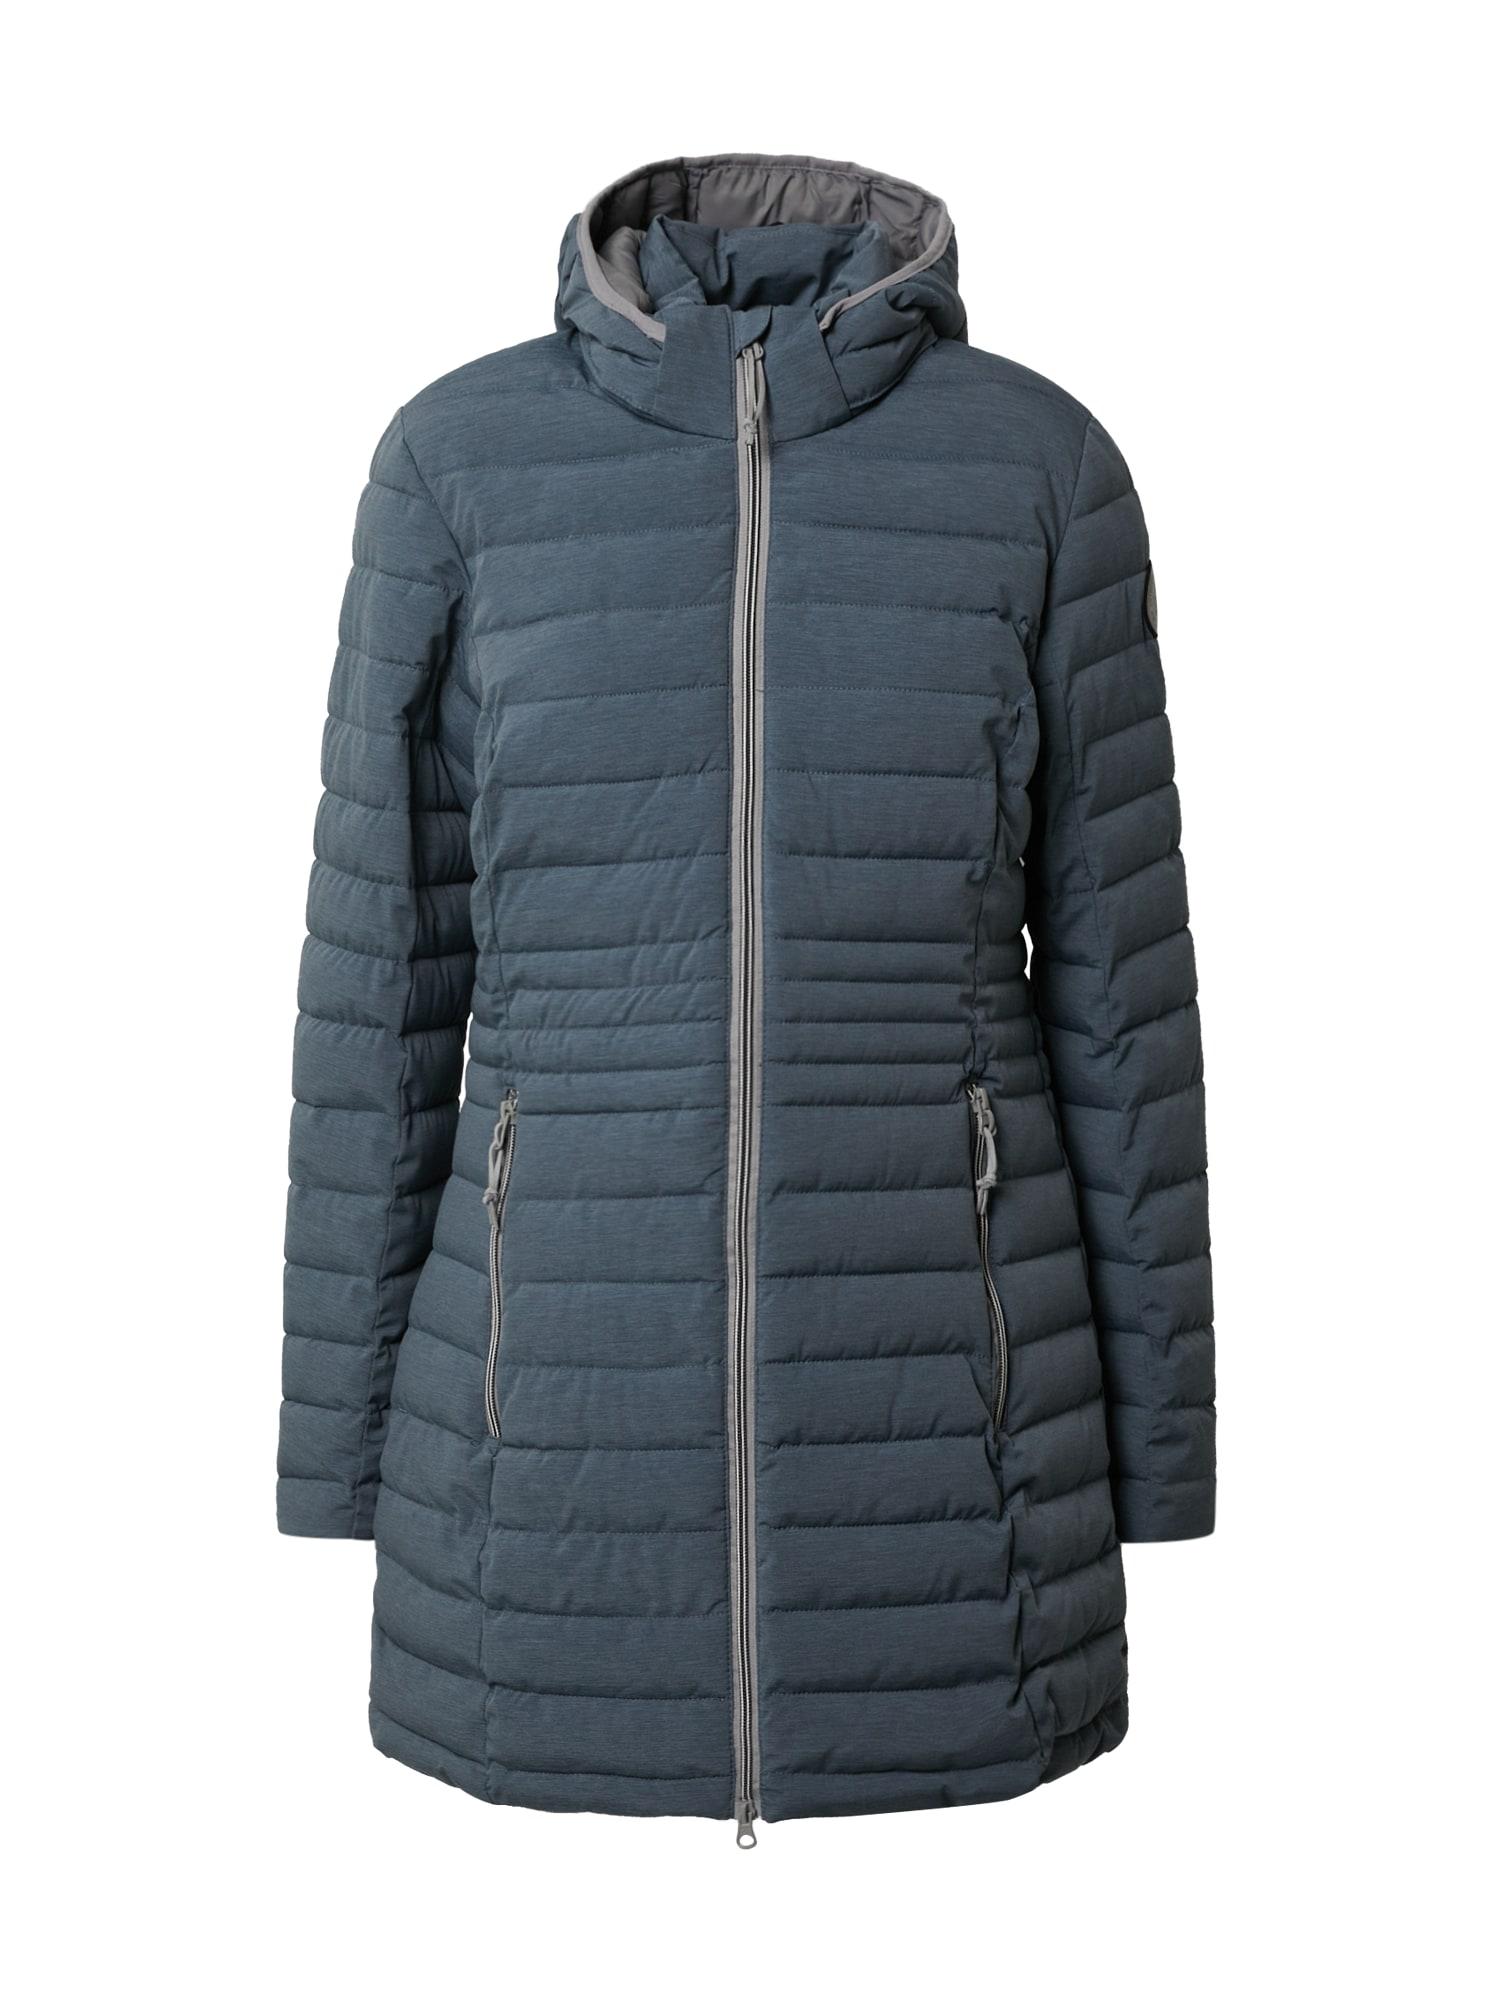 G.I.G.A. DX by killtec Žieminis paltas